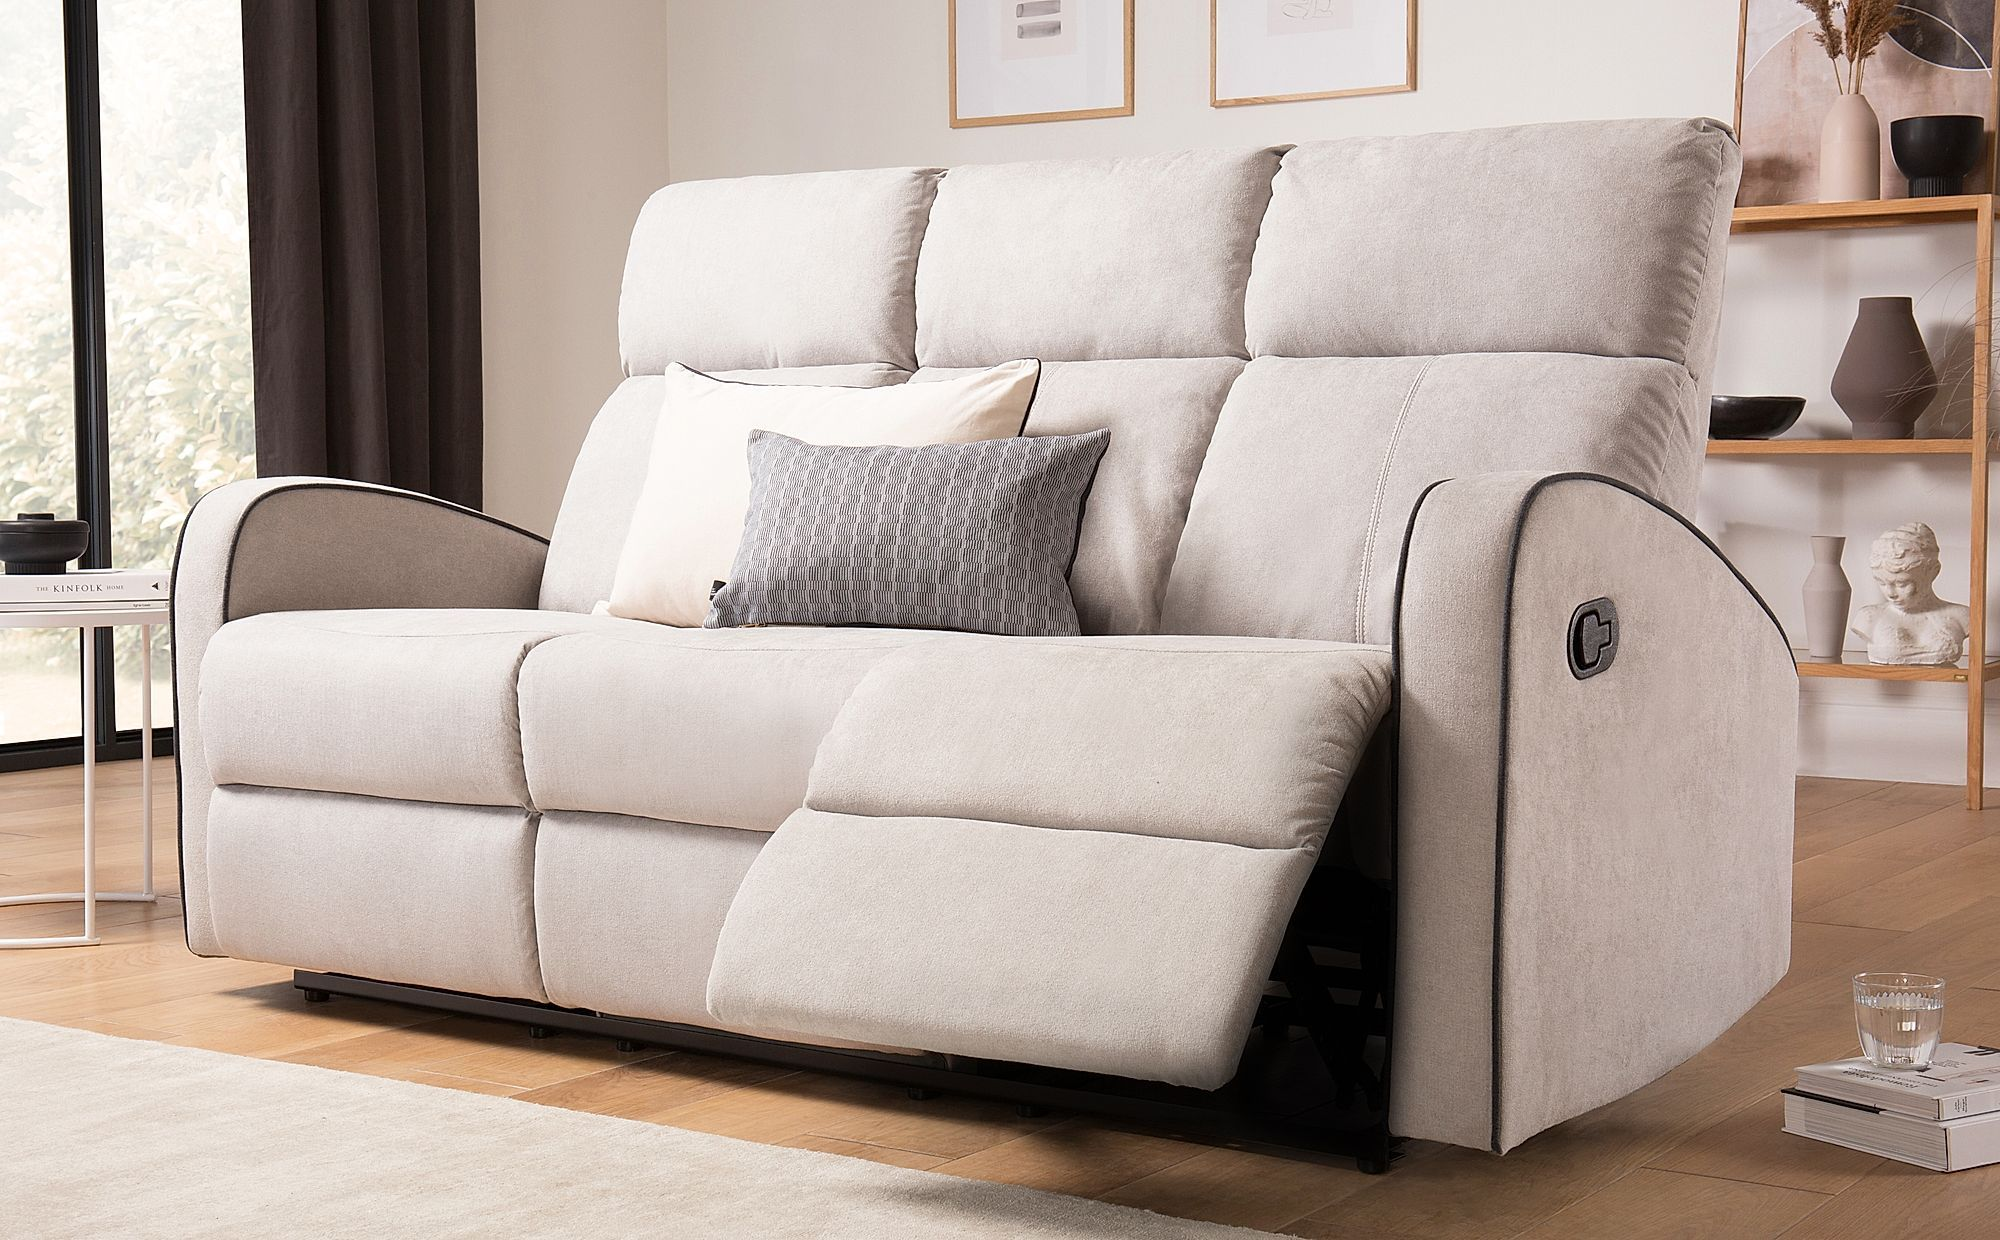 Seater Recliner Sofa